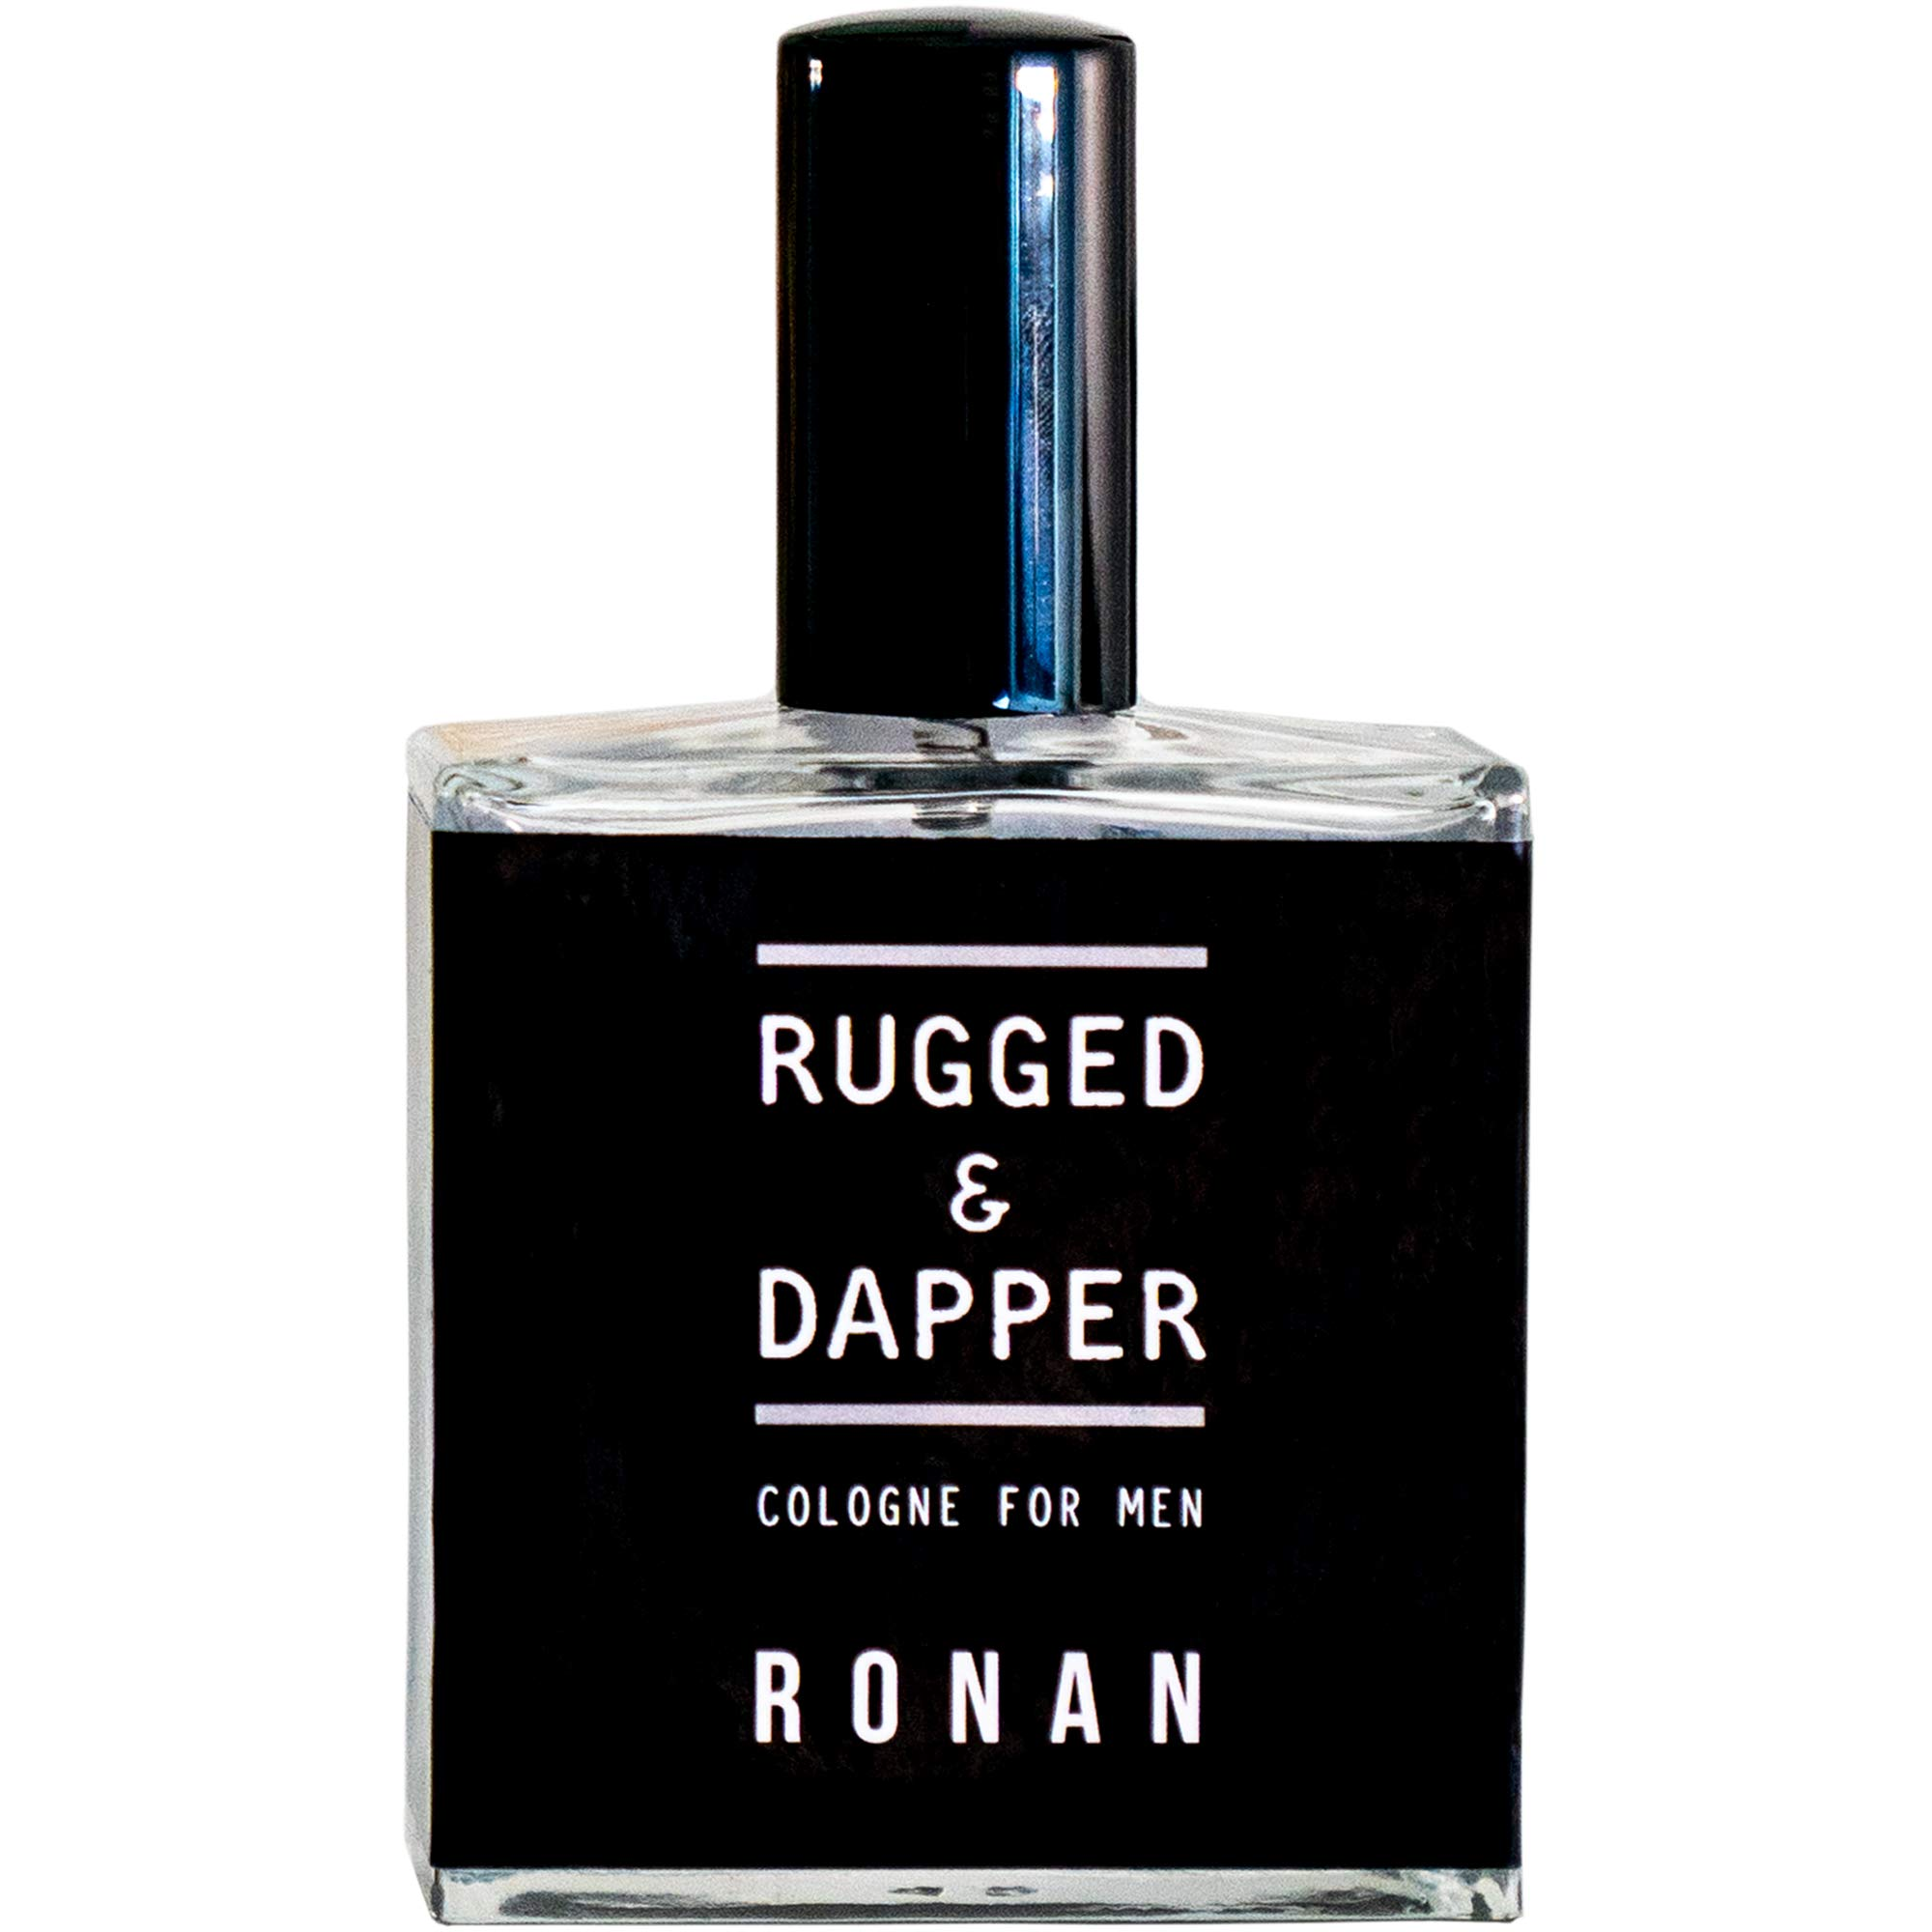 RUGGED & DAPPER Cologne for Men, RONAN 3.4 Oz